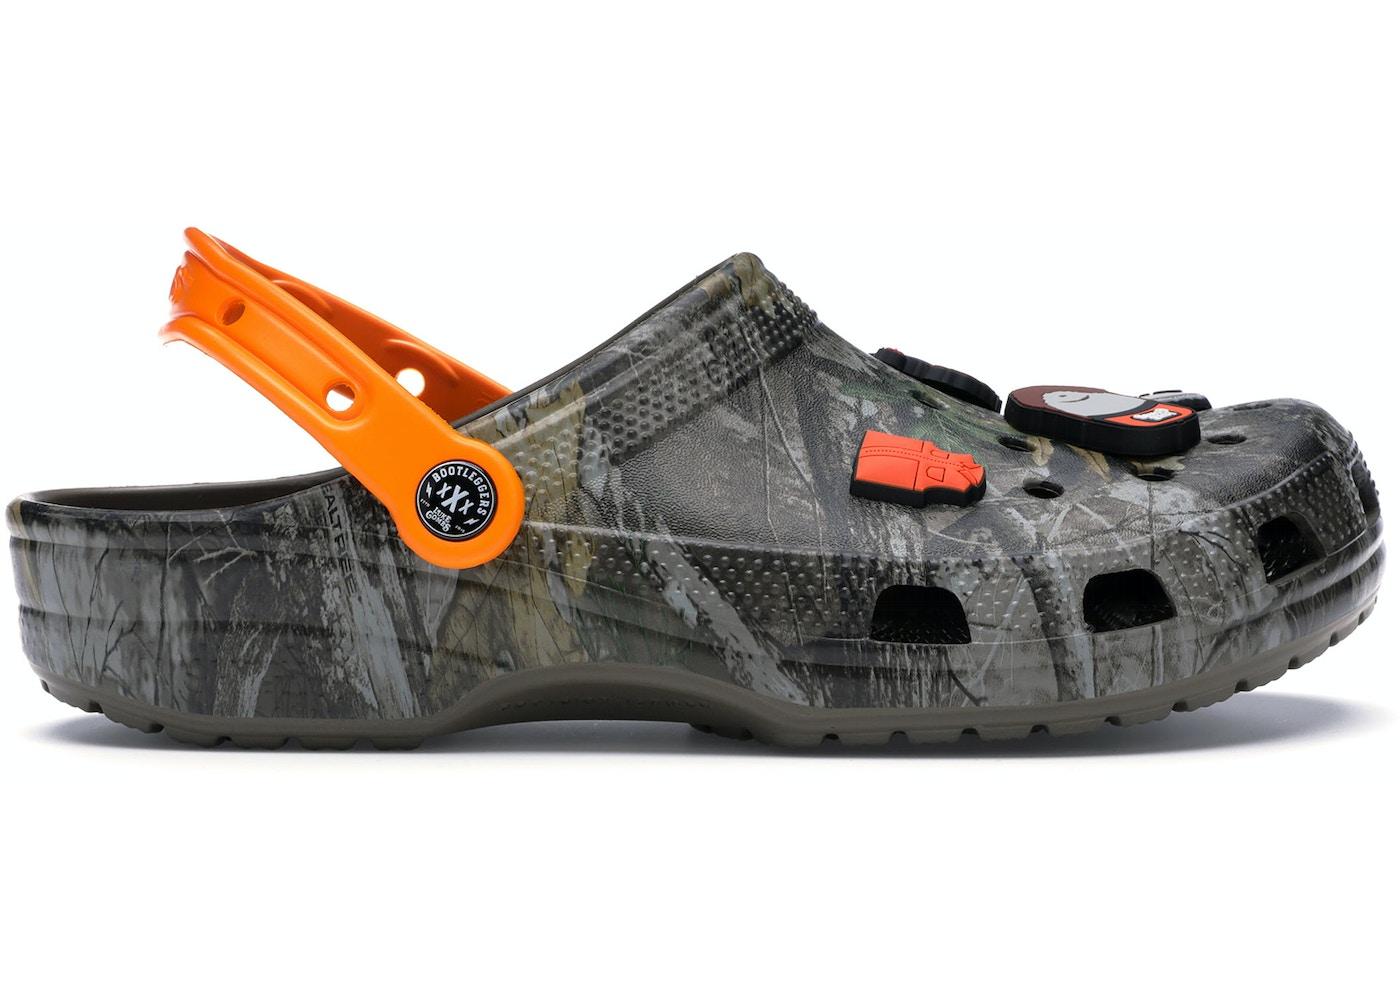 Crocs Classic Clog Luke Combs Realtree Camo 206602 267